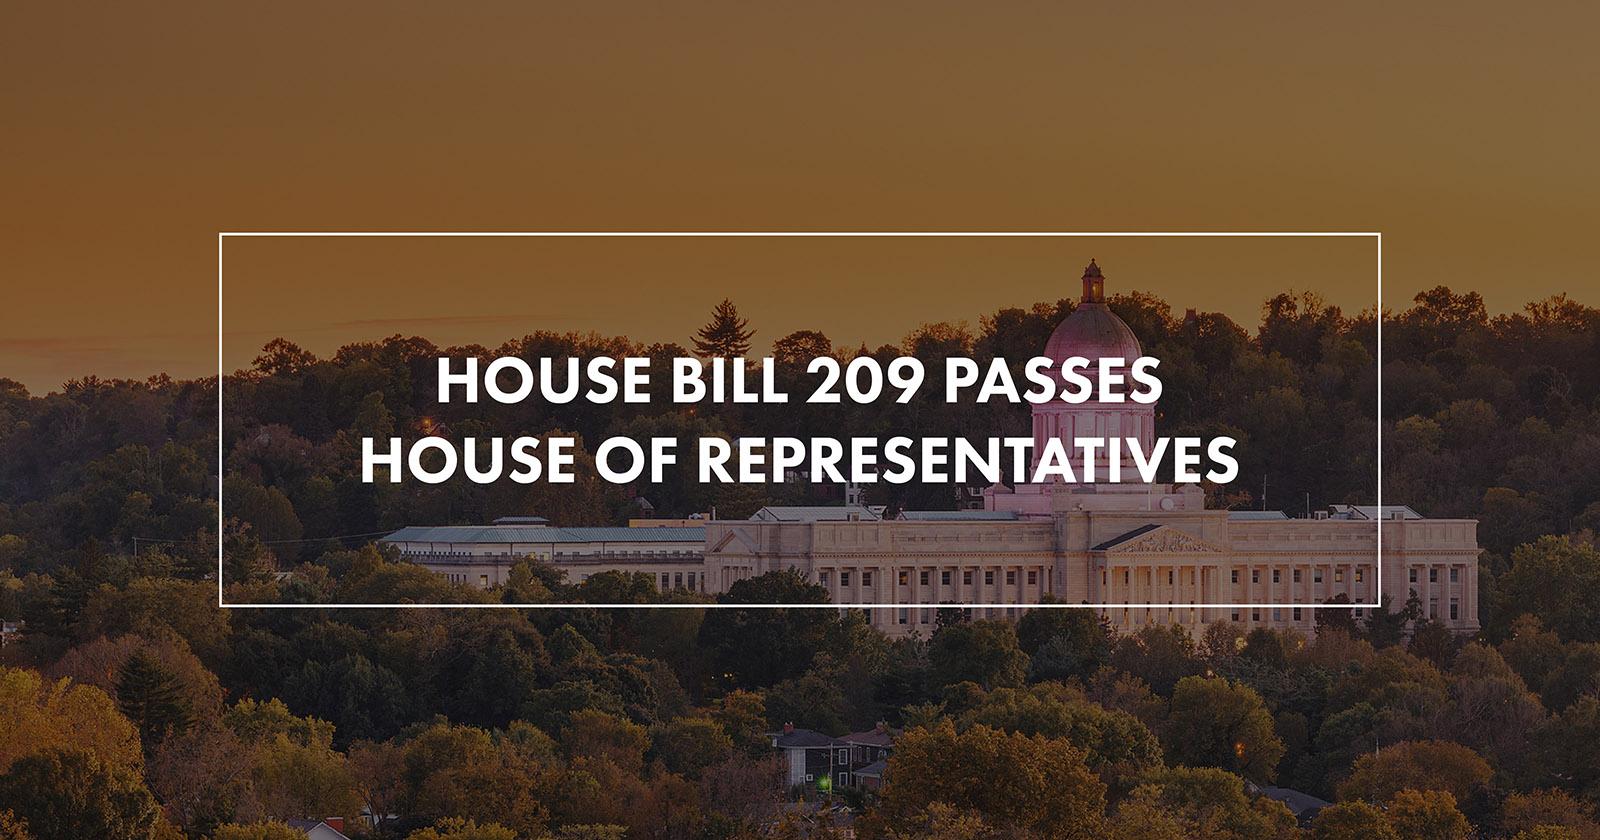 House Bill 209